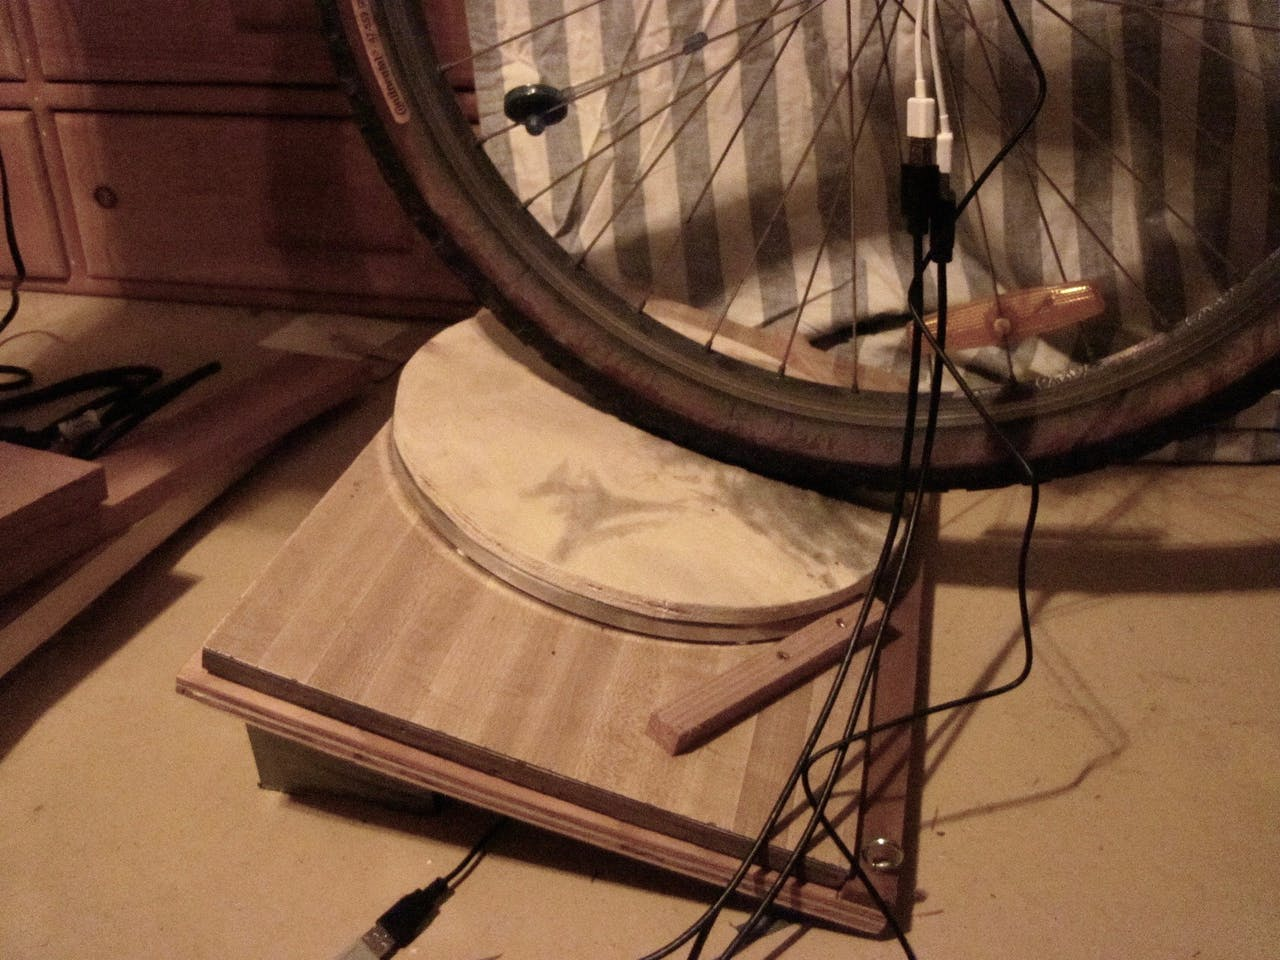 Usbcycle Ride Through Your Virtual World Rack Saver Switch Wiring Diagram